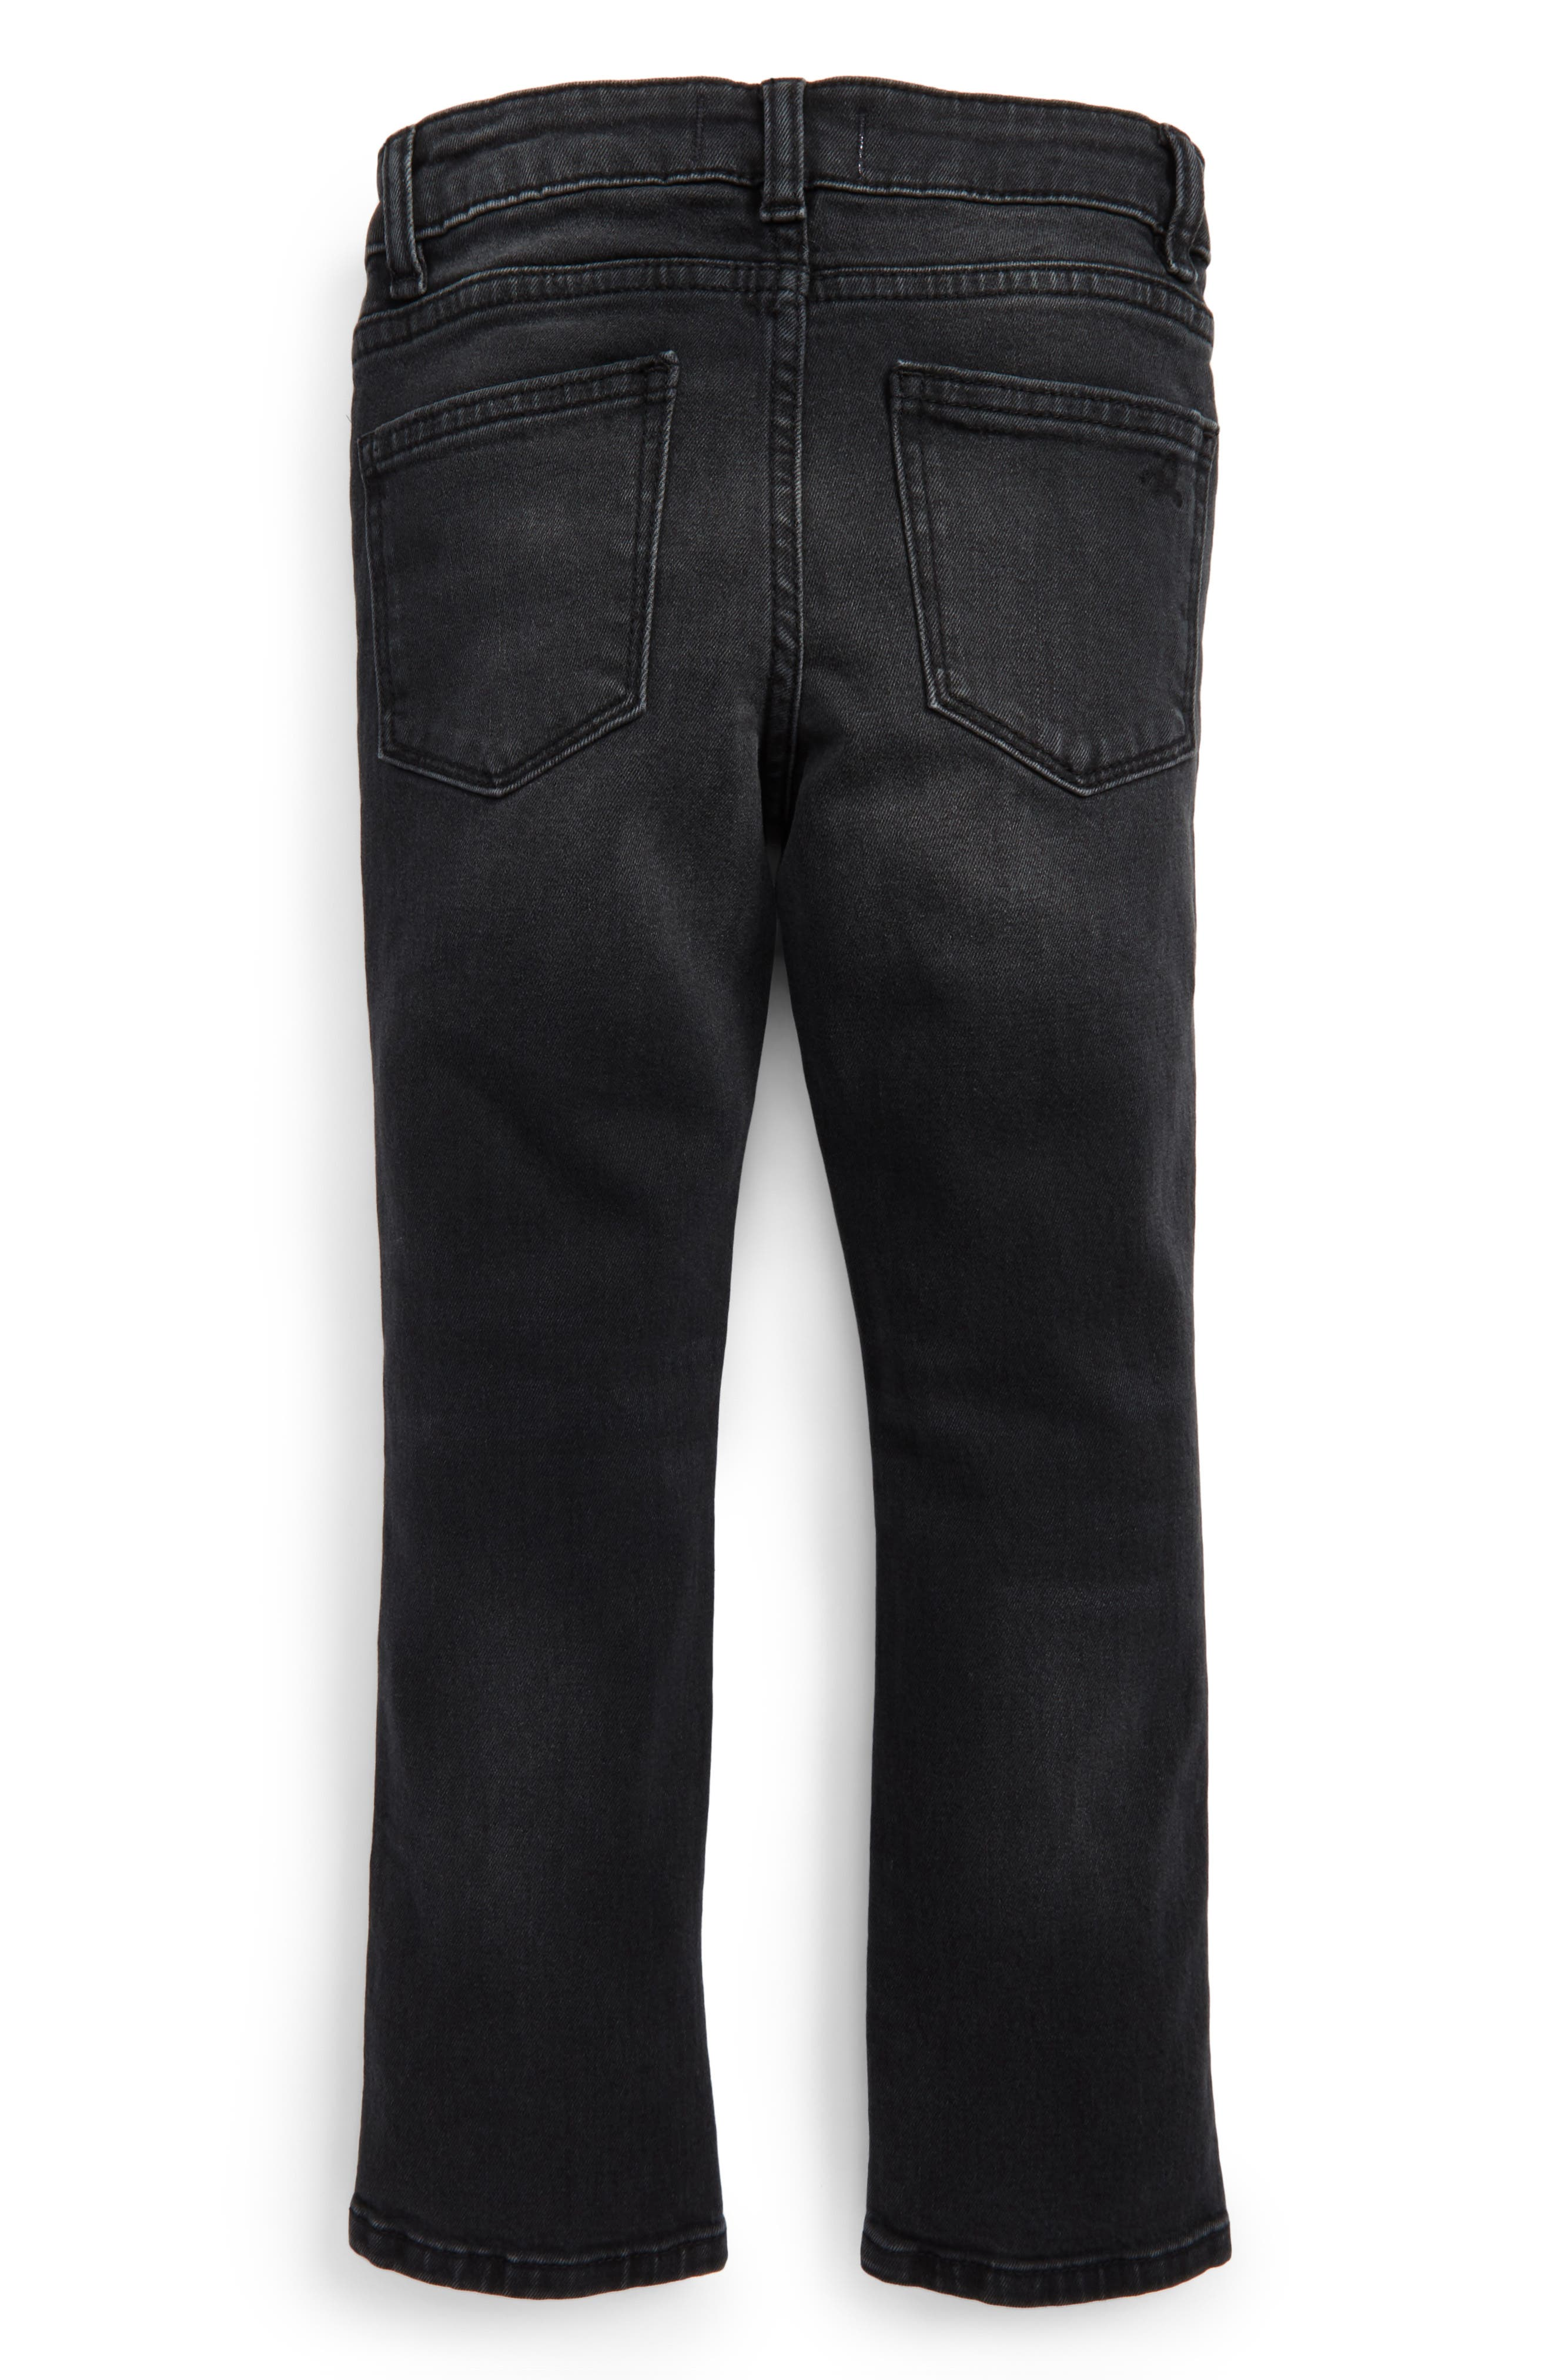 DL 1961 Hawke Skinny Jeans,                             Alternate thumbnail 2, color,                             400